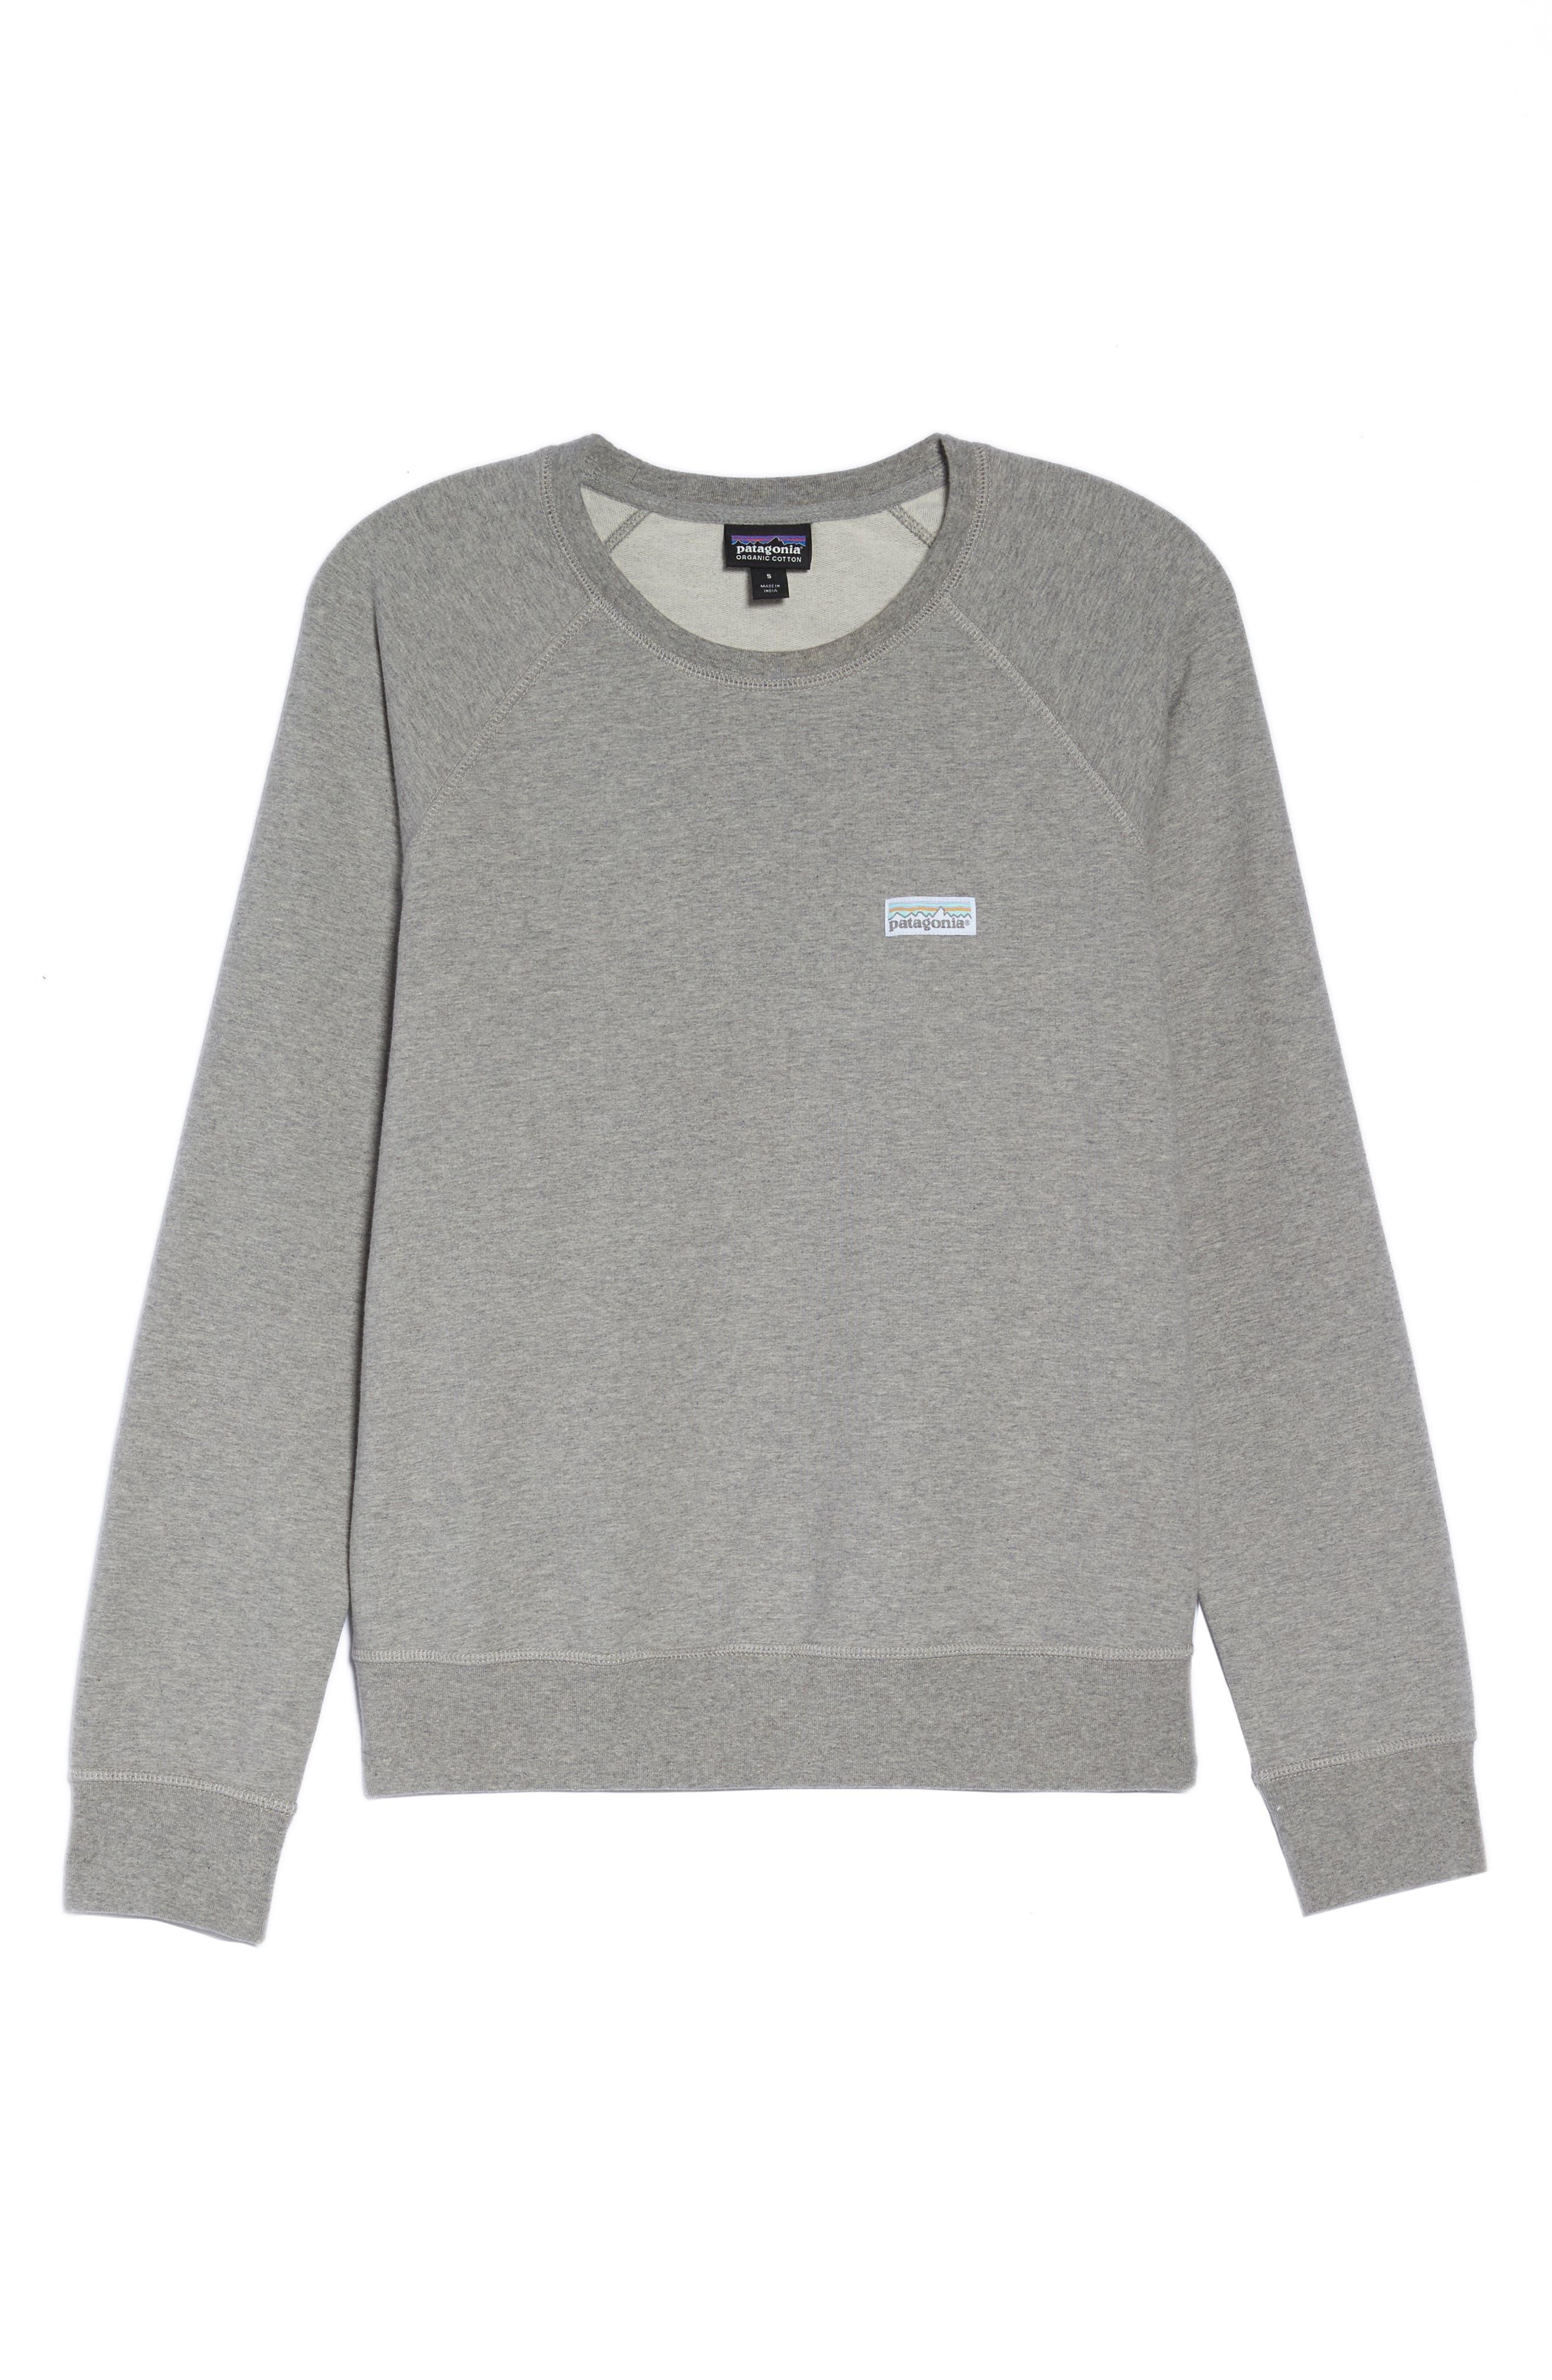 Pastel P-6 Label Midweight Sweatshirt,                             Alternate thumbnail 7, color,                             020